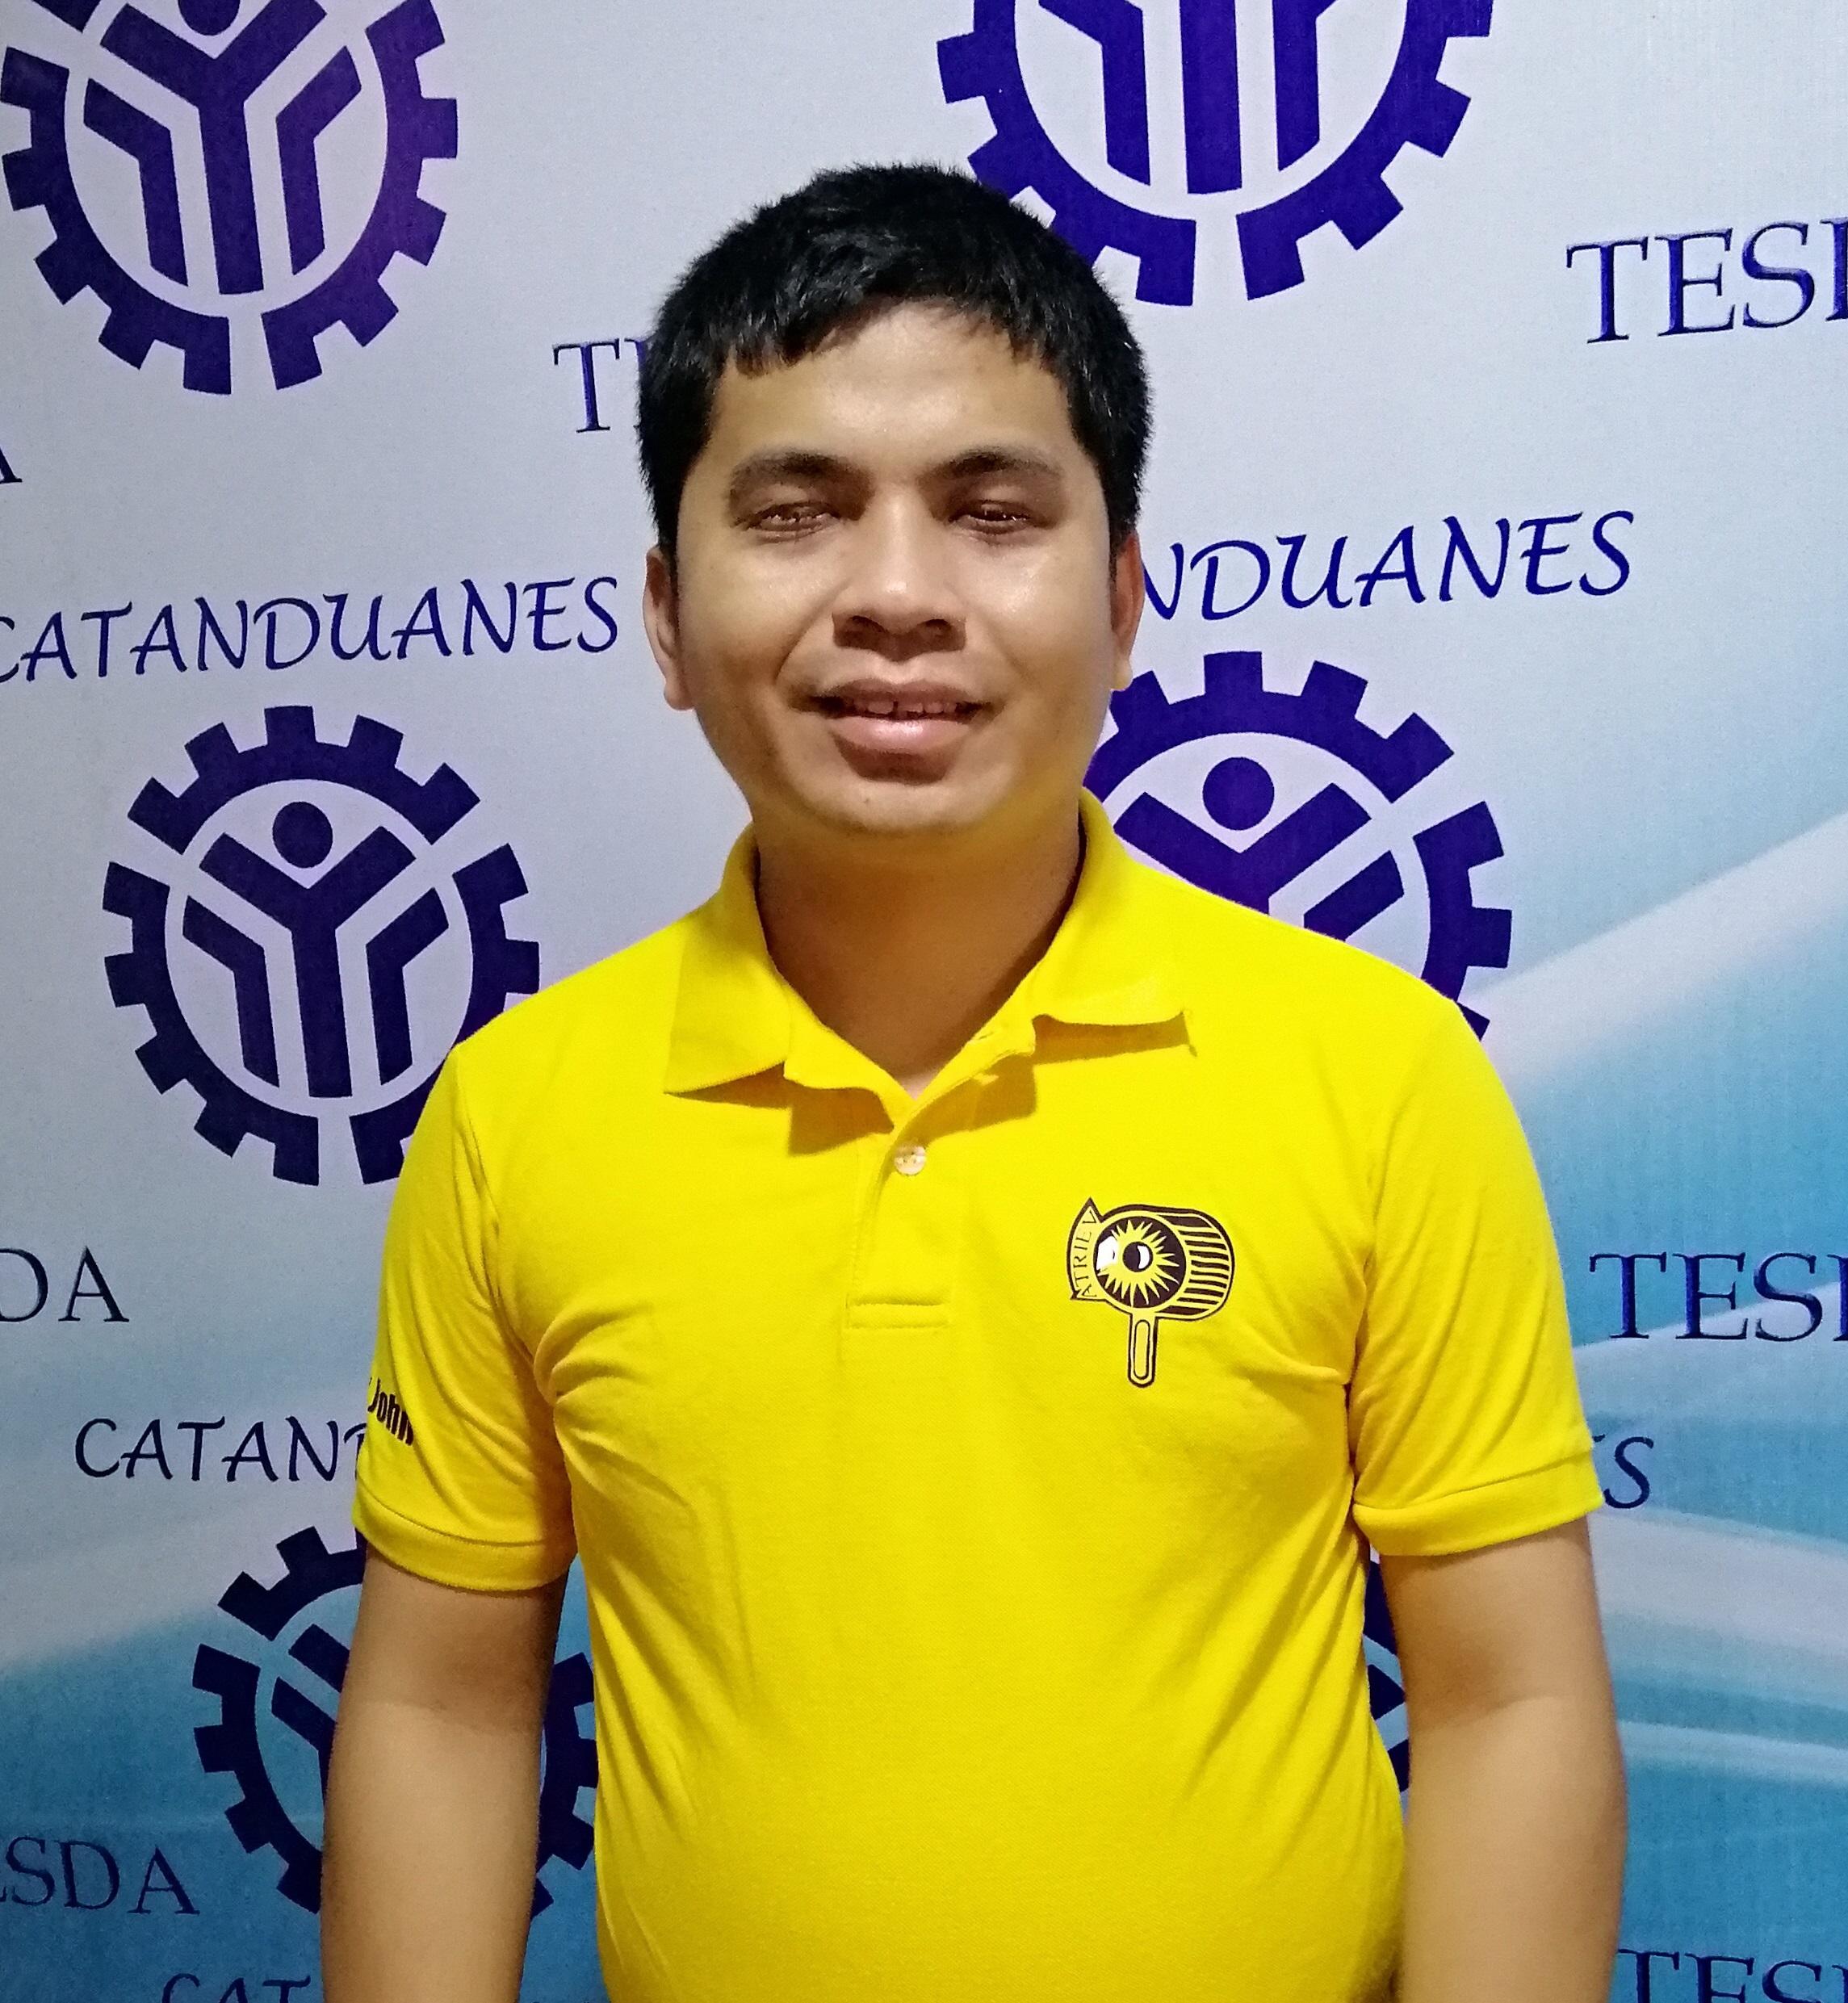 Sir Haber Jhon wearing the ATRIEV yellow polo shirt